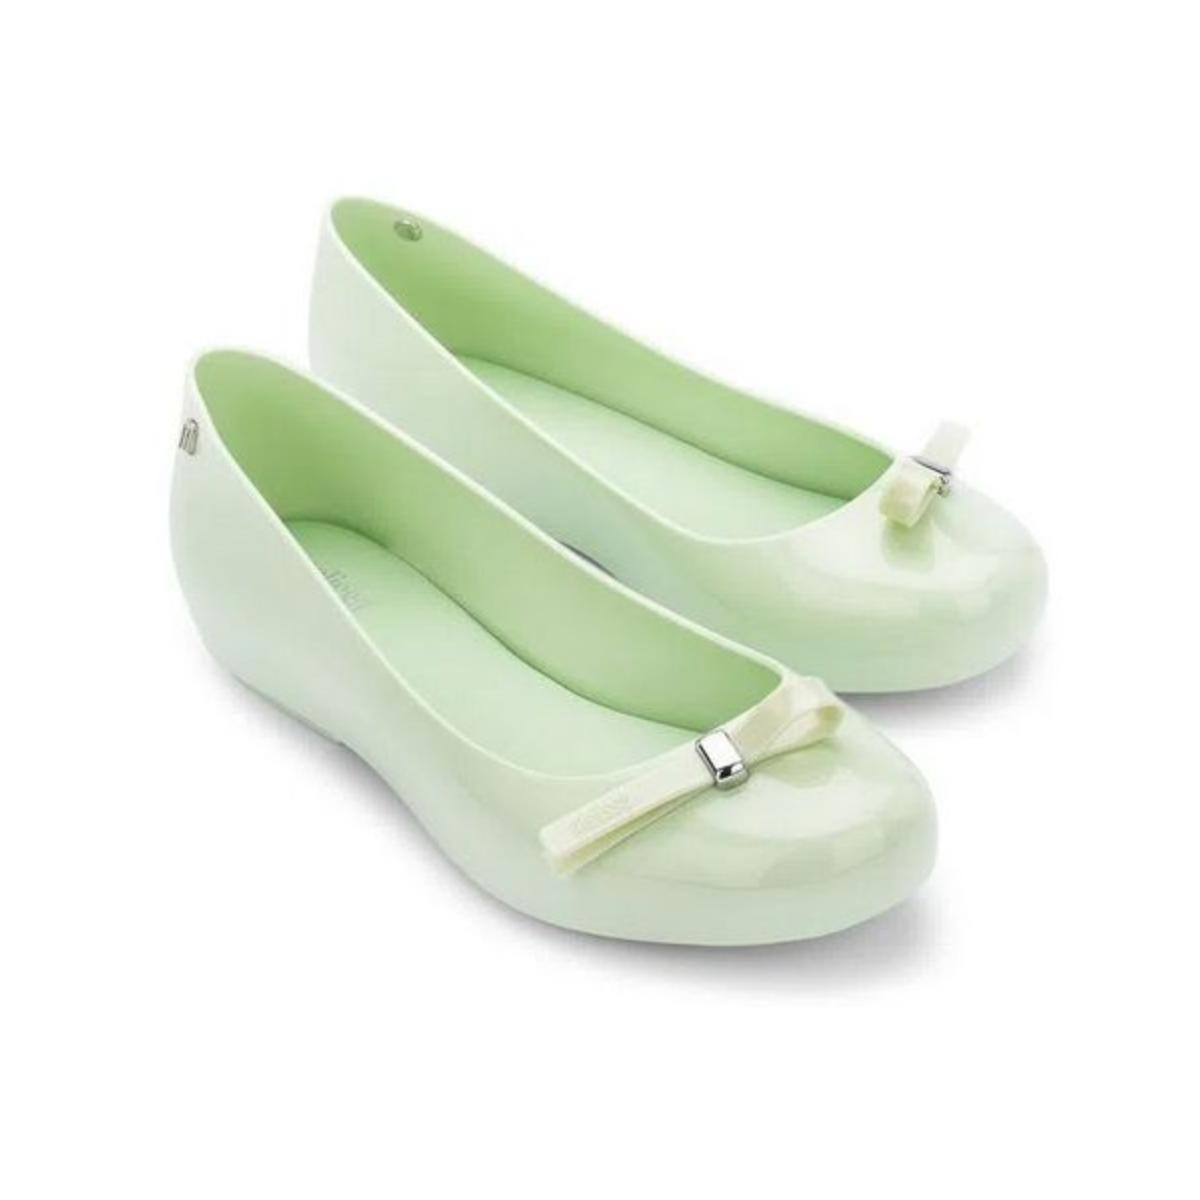 Sapatilha Feminina Melissa 33299 50529 Dora ad Verde